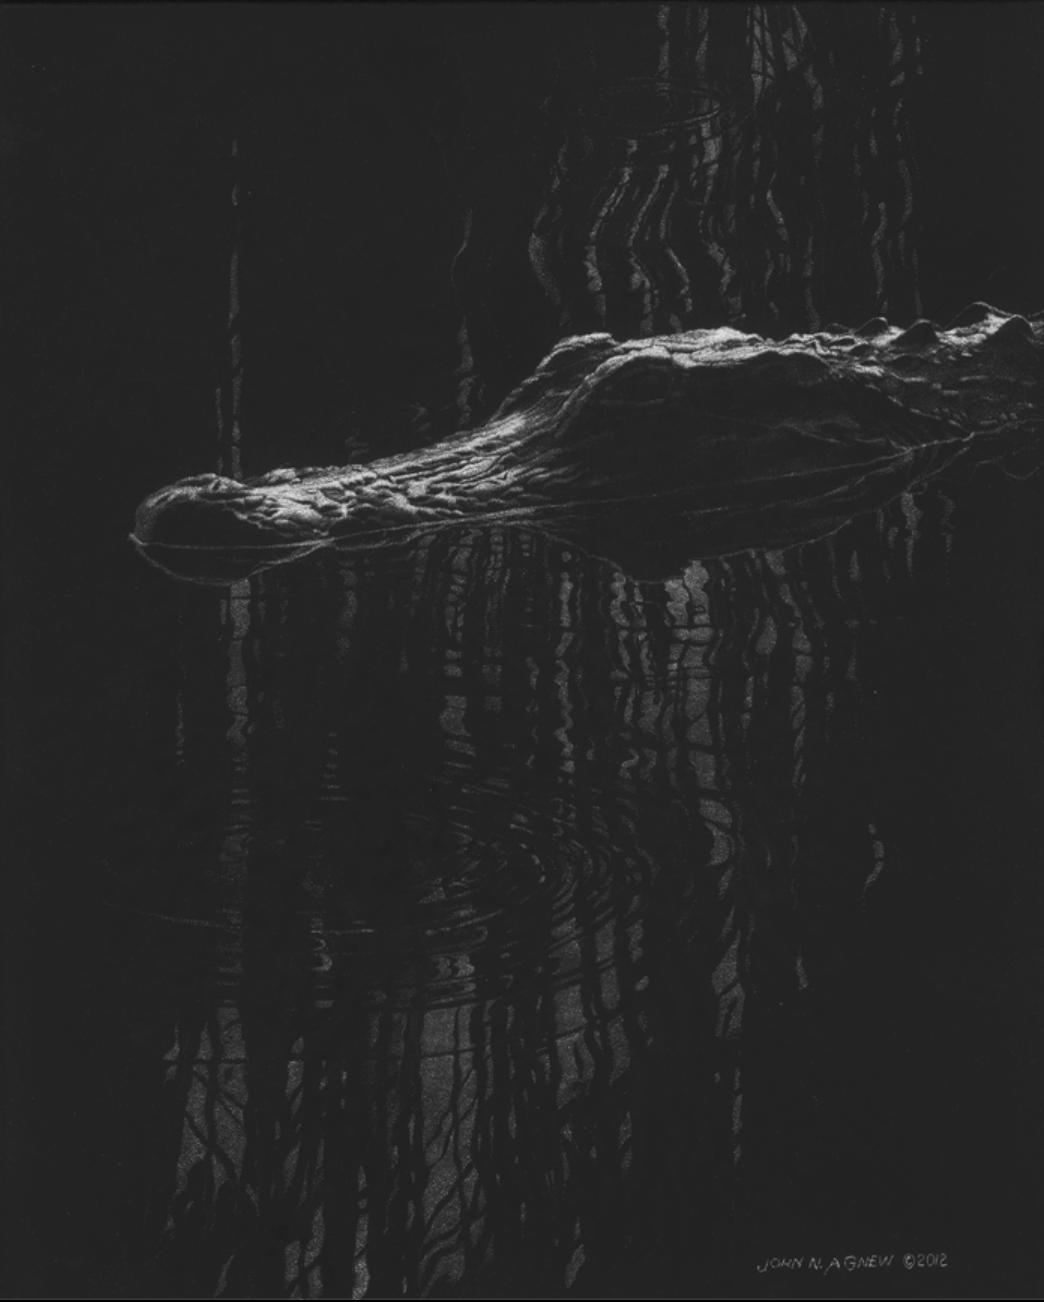 JOHN H. AGNEW, GATOR REFLECTIONS  SCRATCHBOARD, 12 IN. X 9IN.